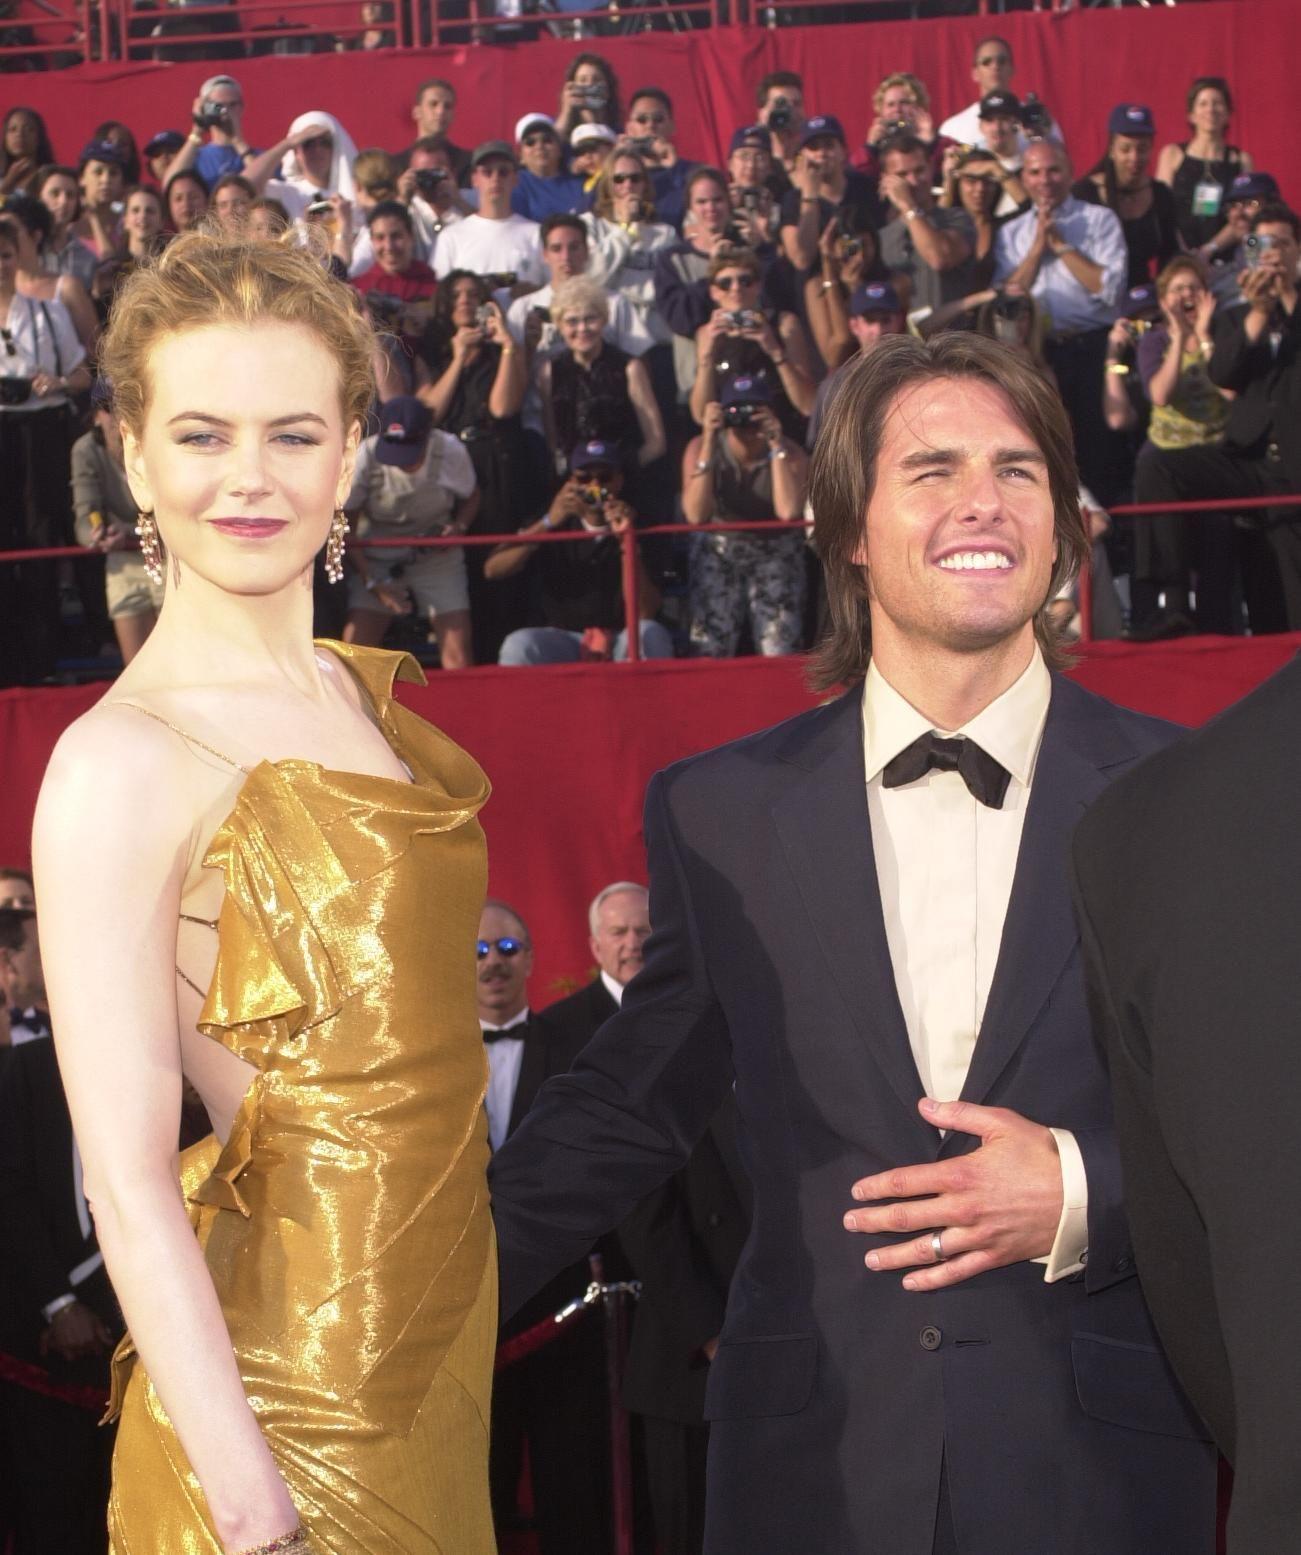 photos of Nicole Kidman